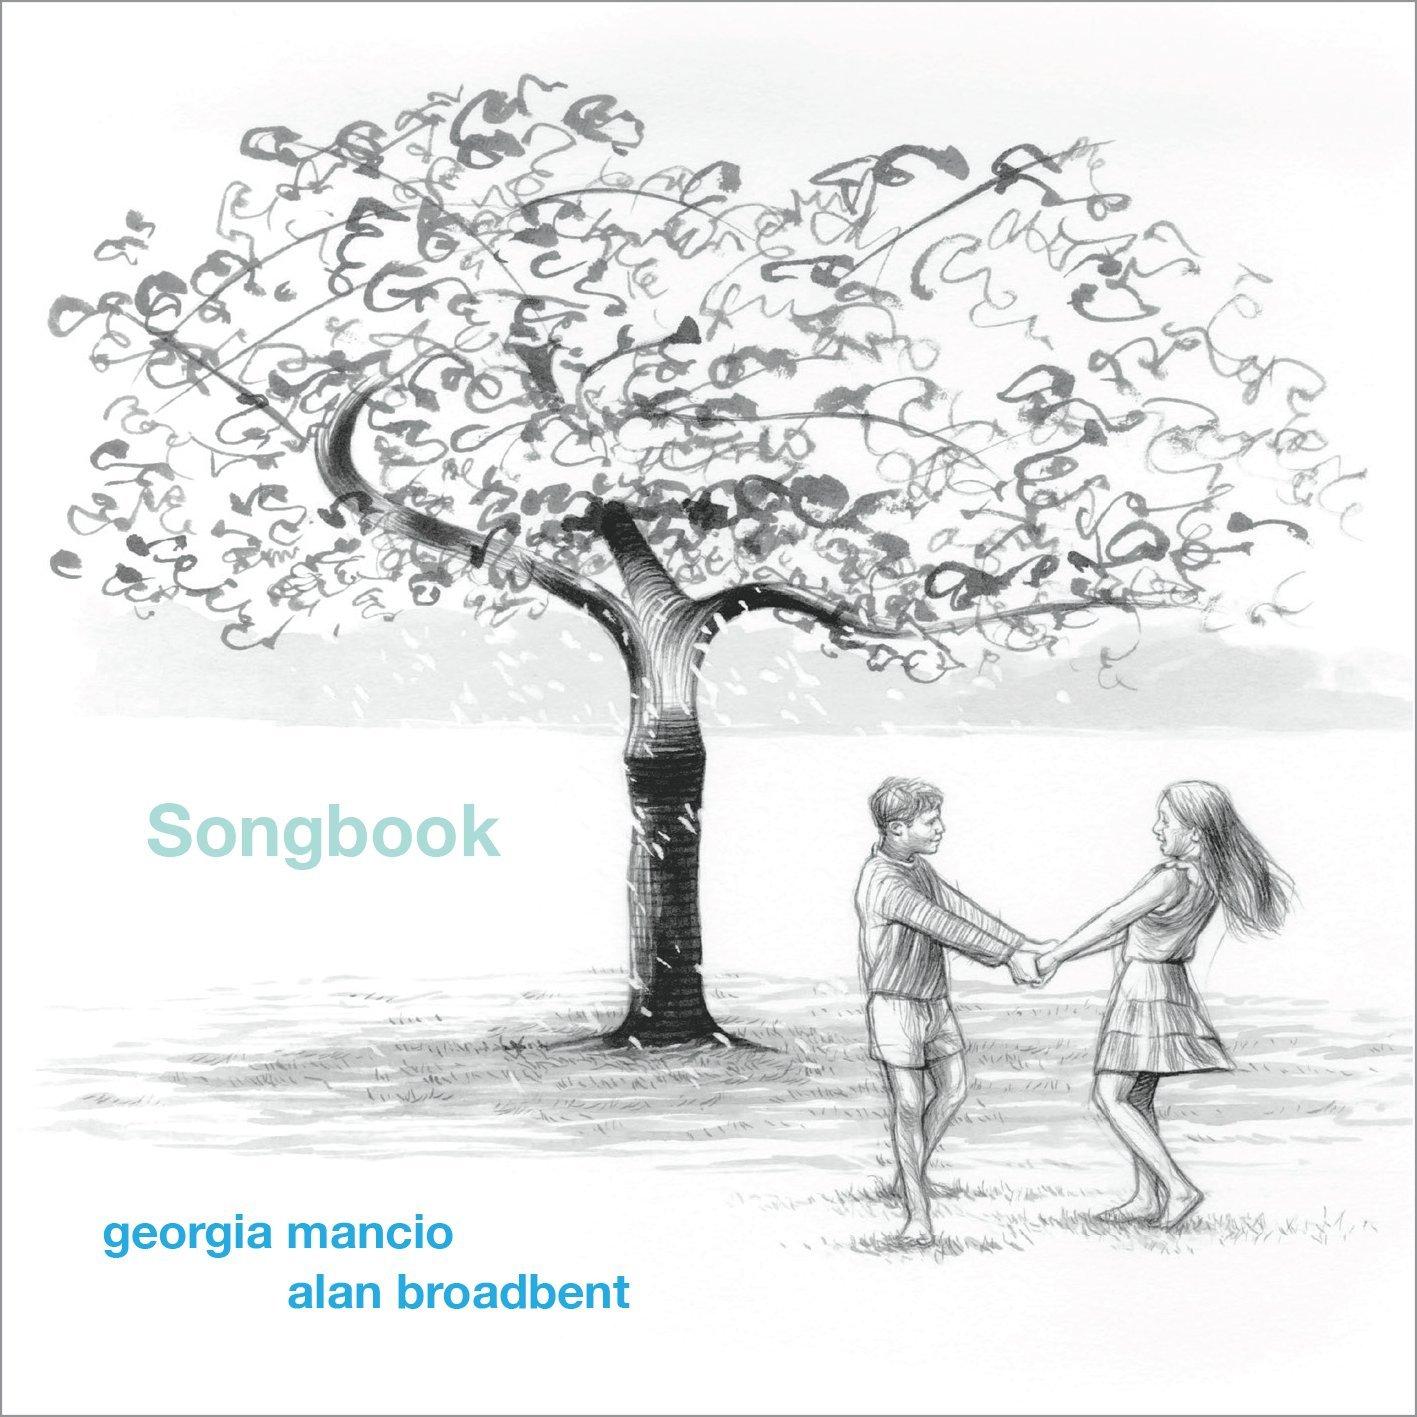 Georgia Mancio and Alan Broadbent - Songbook